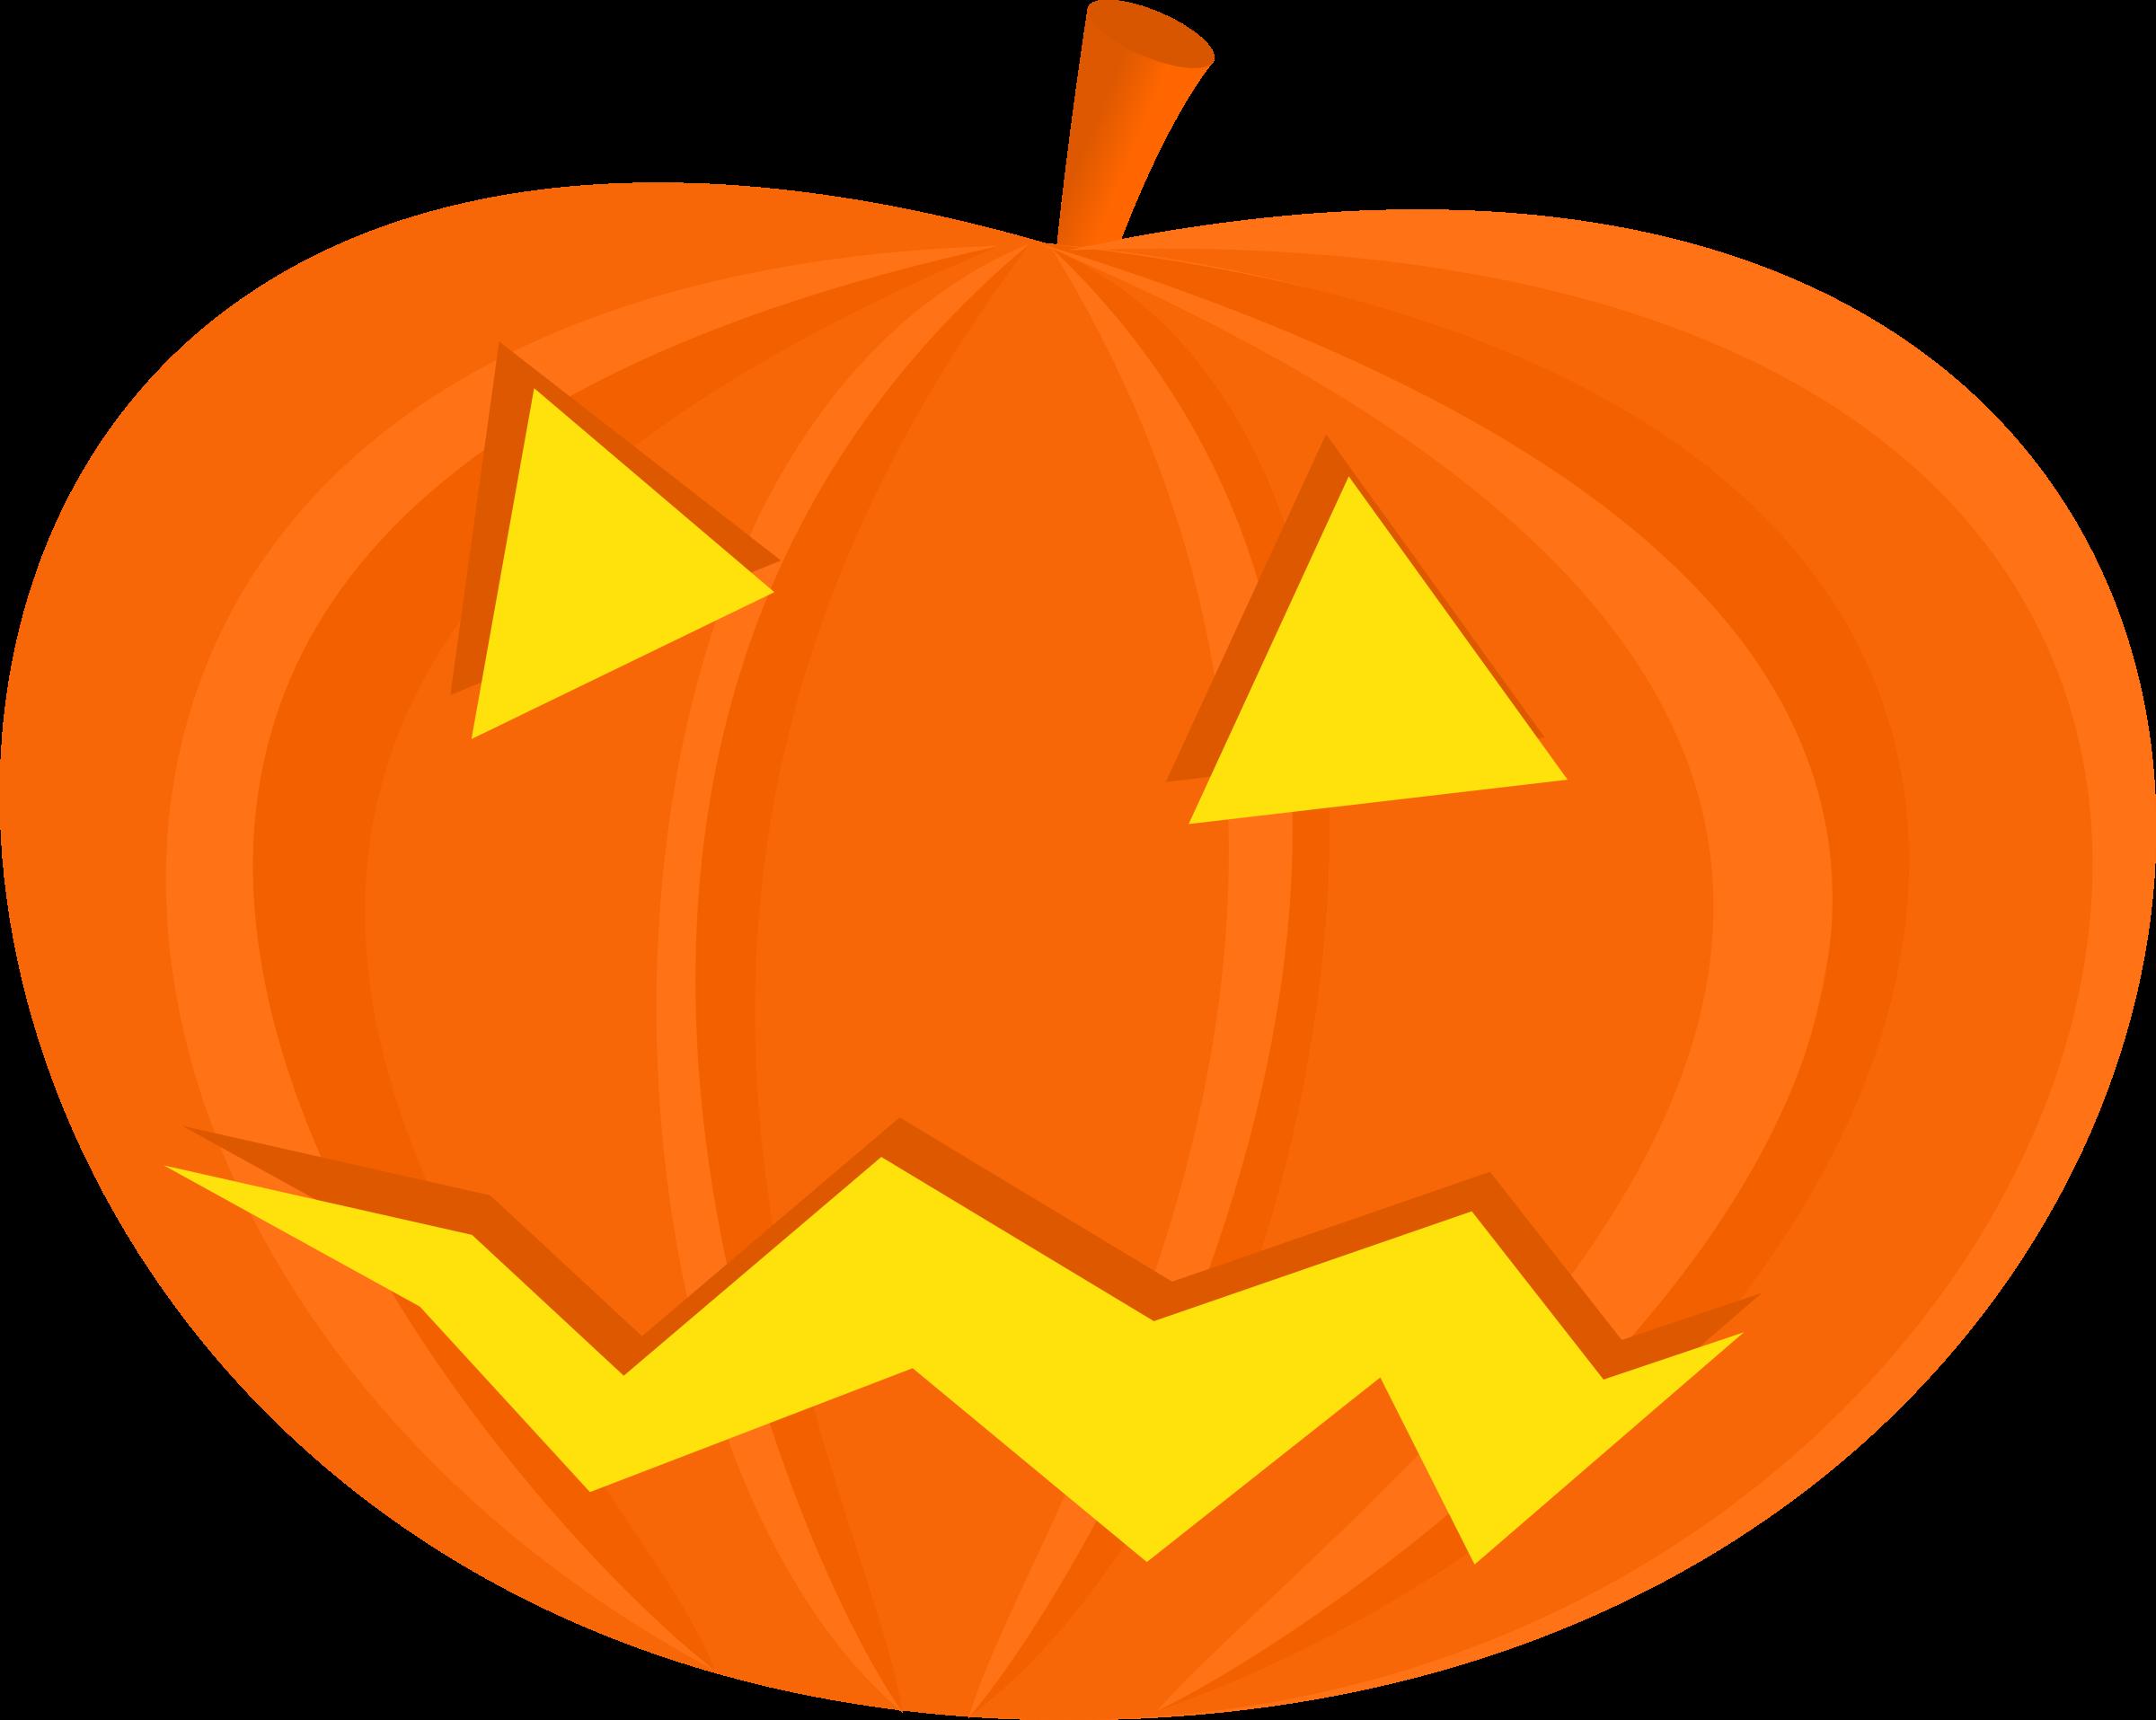 food clipart halloween